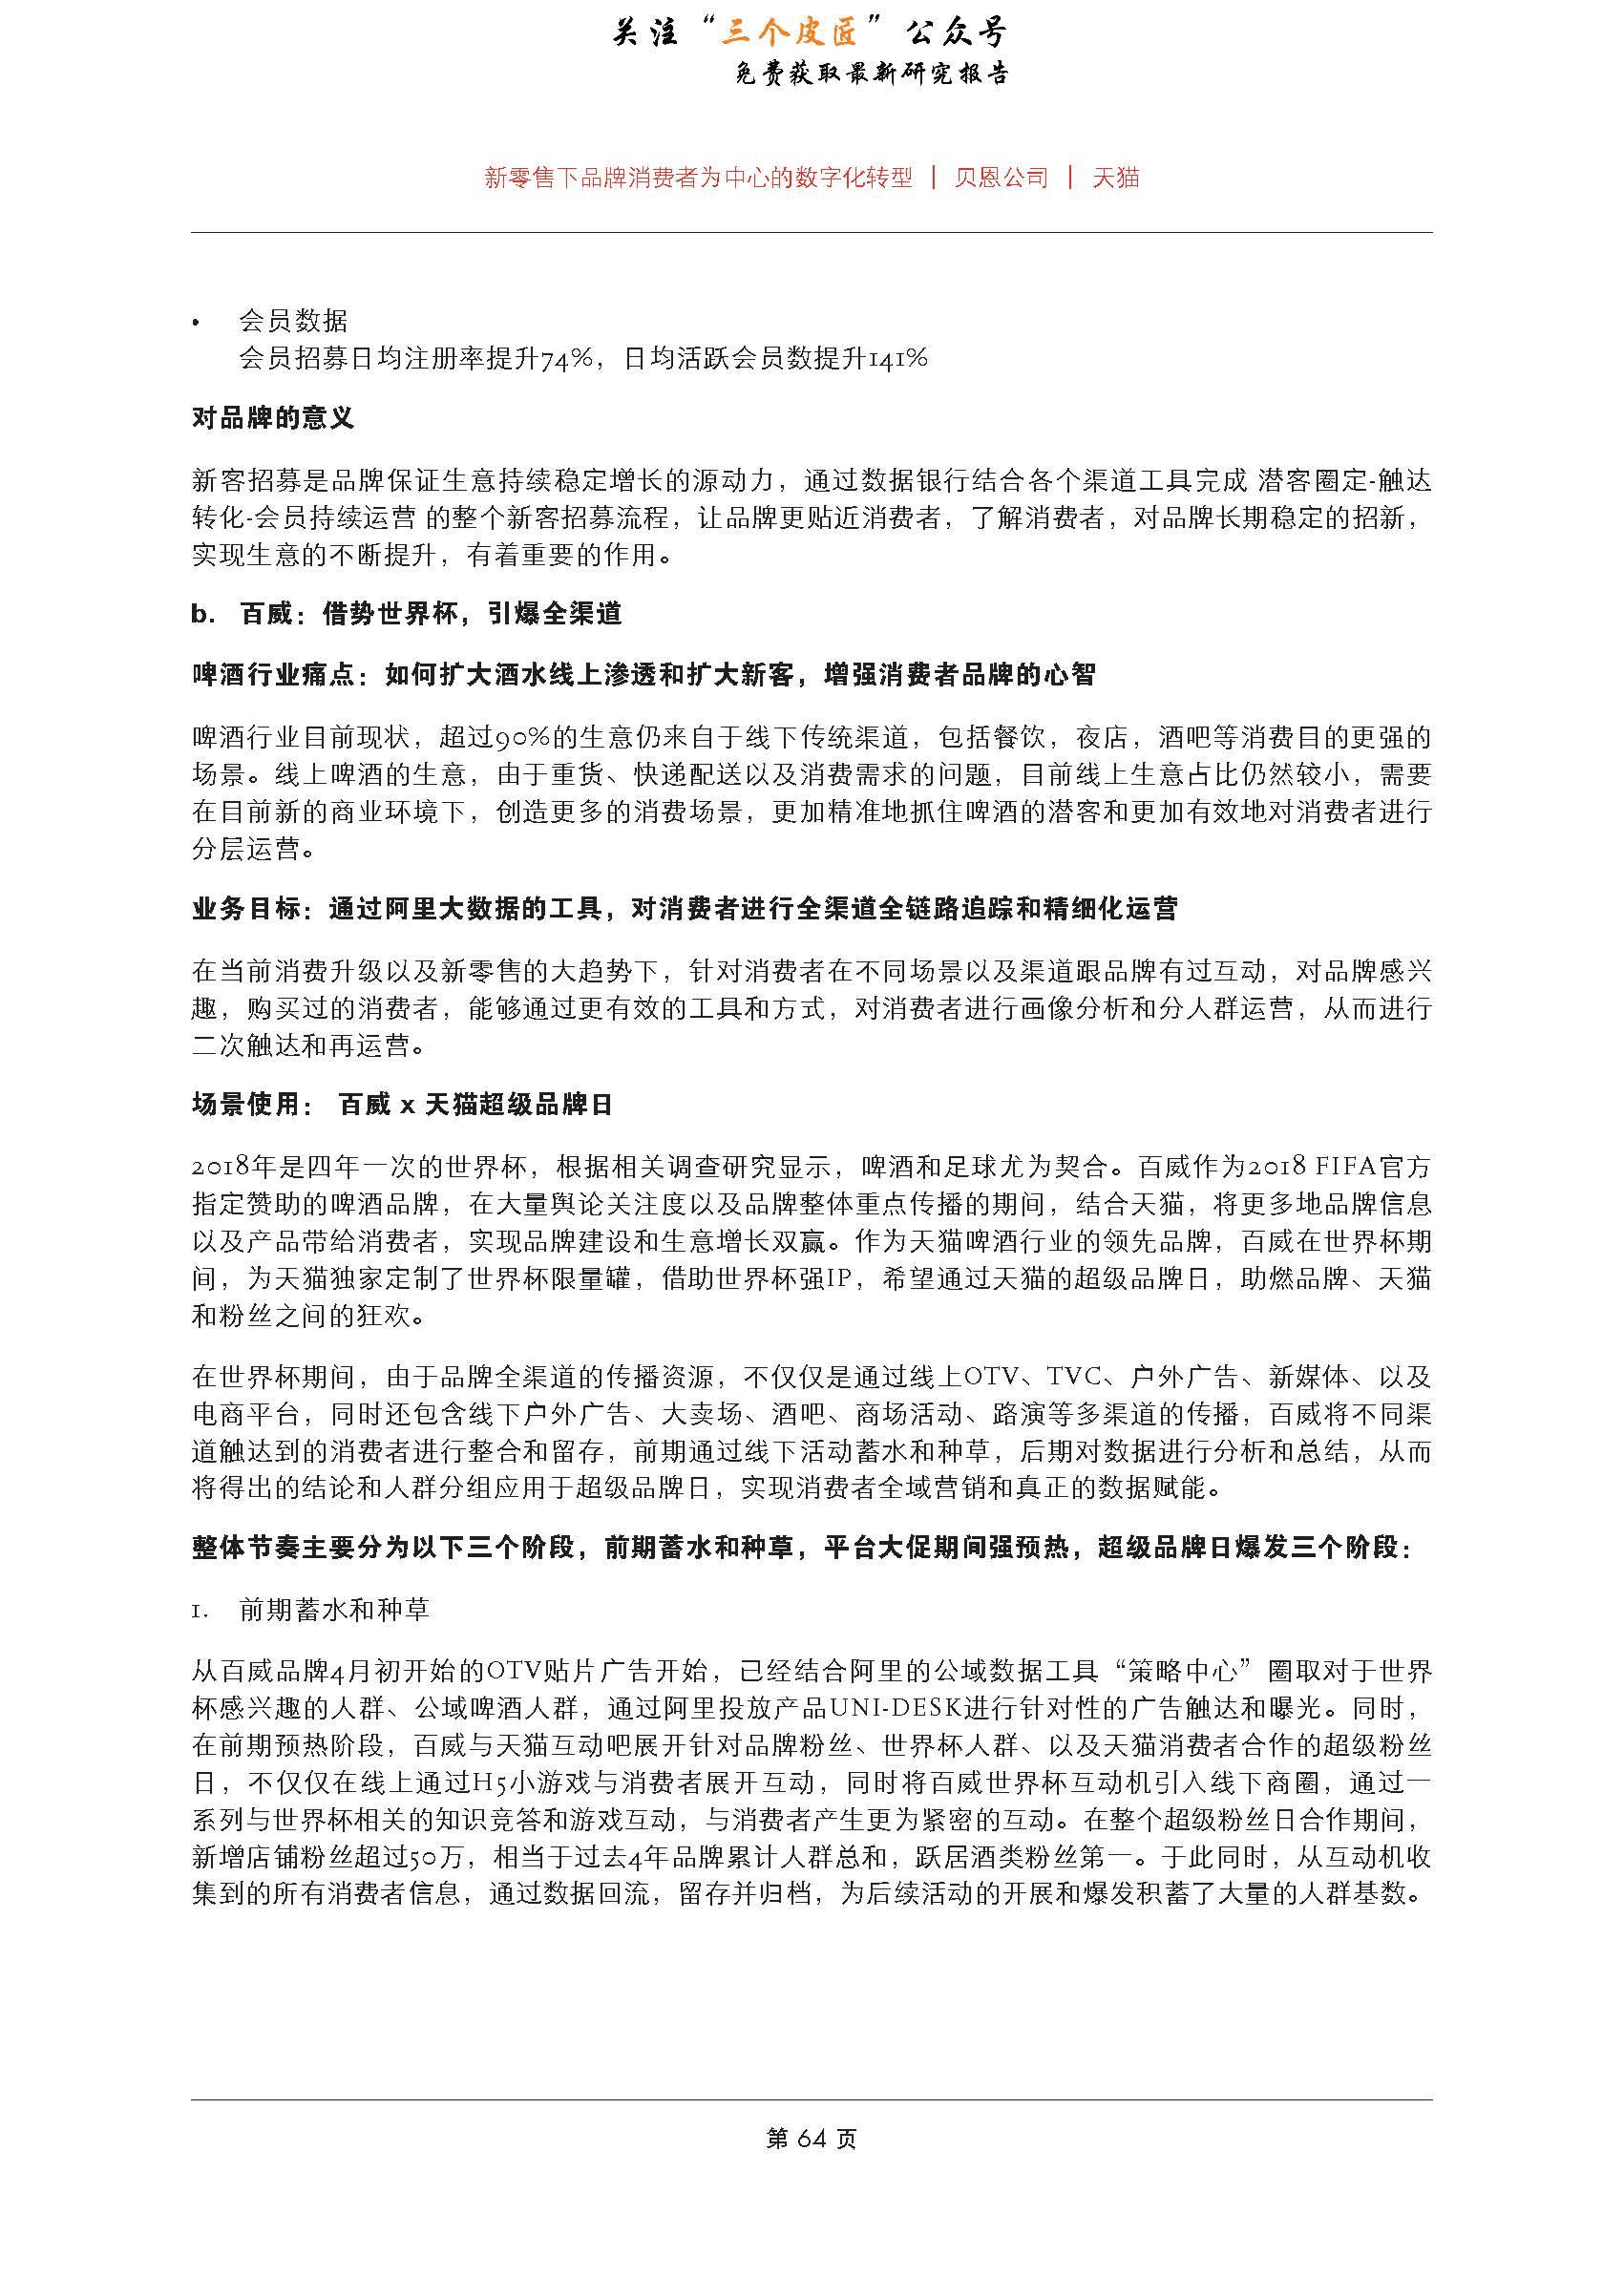 1_Page_66.jpg